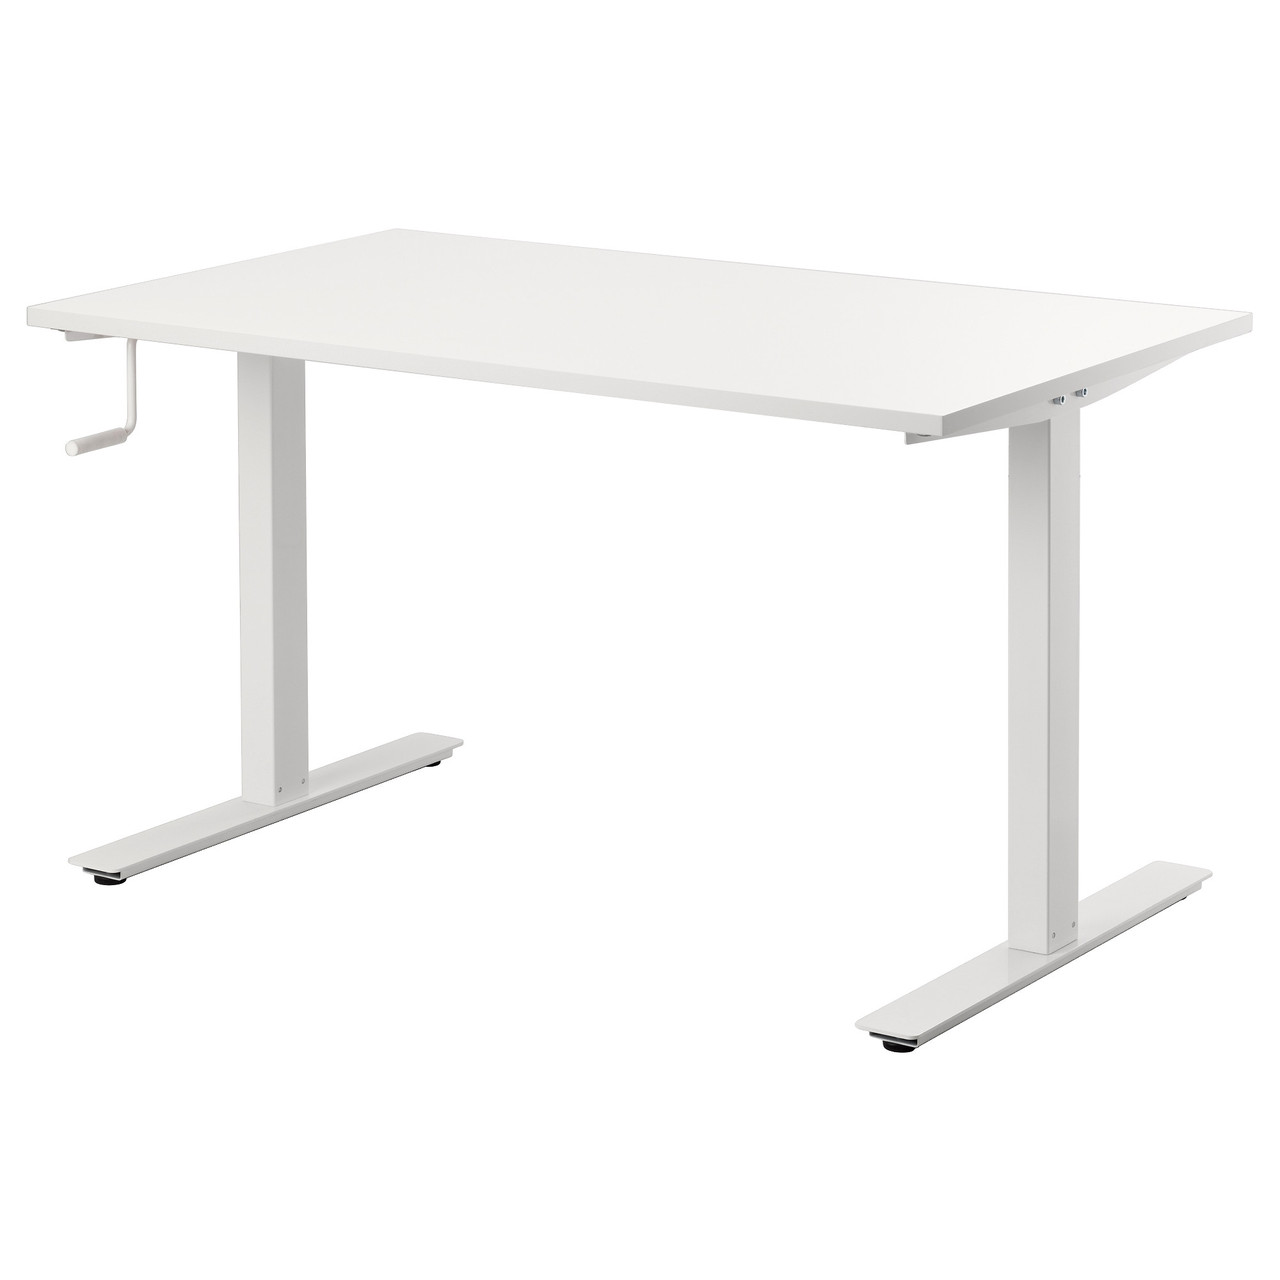 письменный стол Ikea Skarsta трансформер белый Ikea 49084965